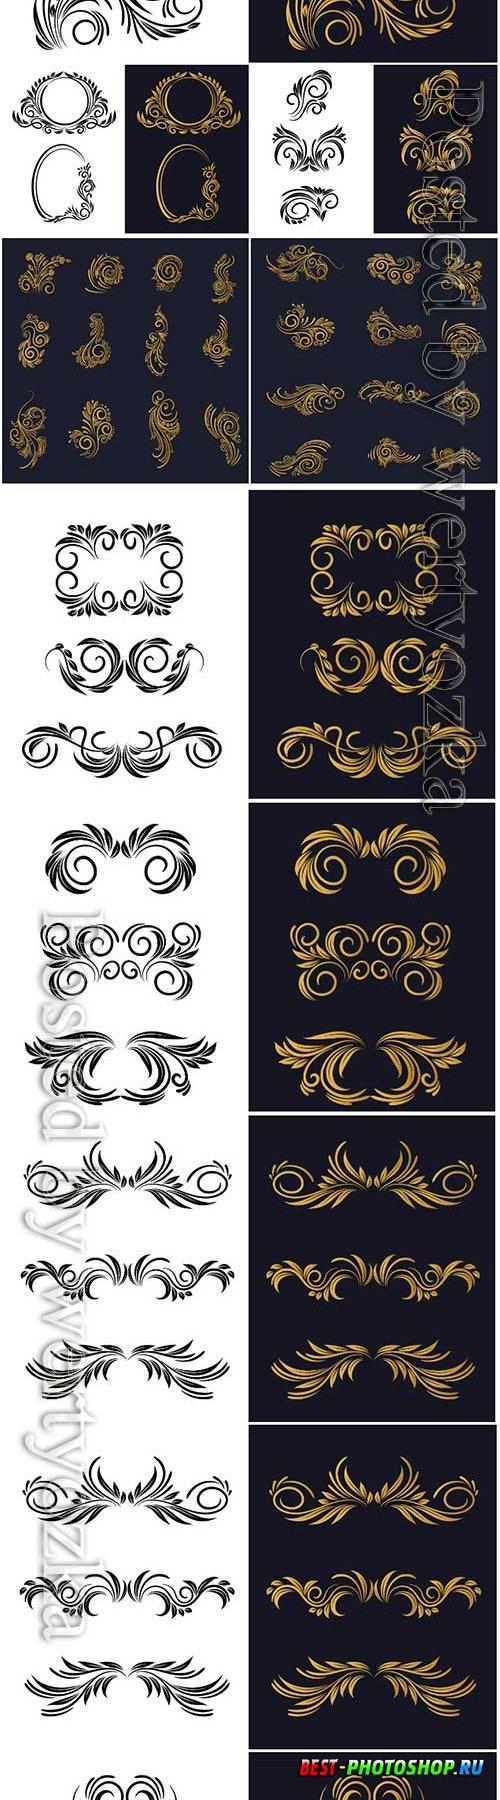 Elegant decorative ornamental floral decorative set design